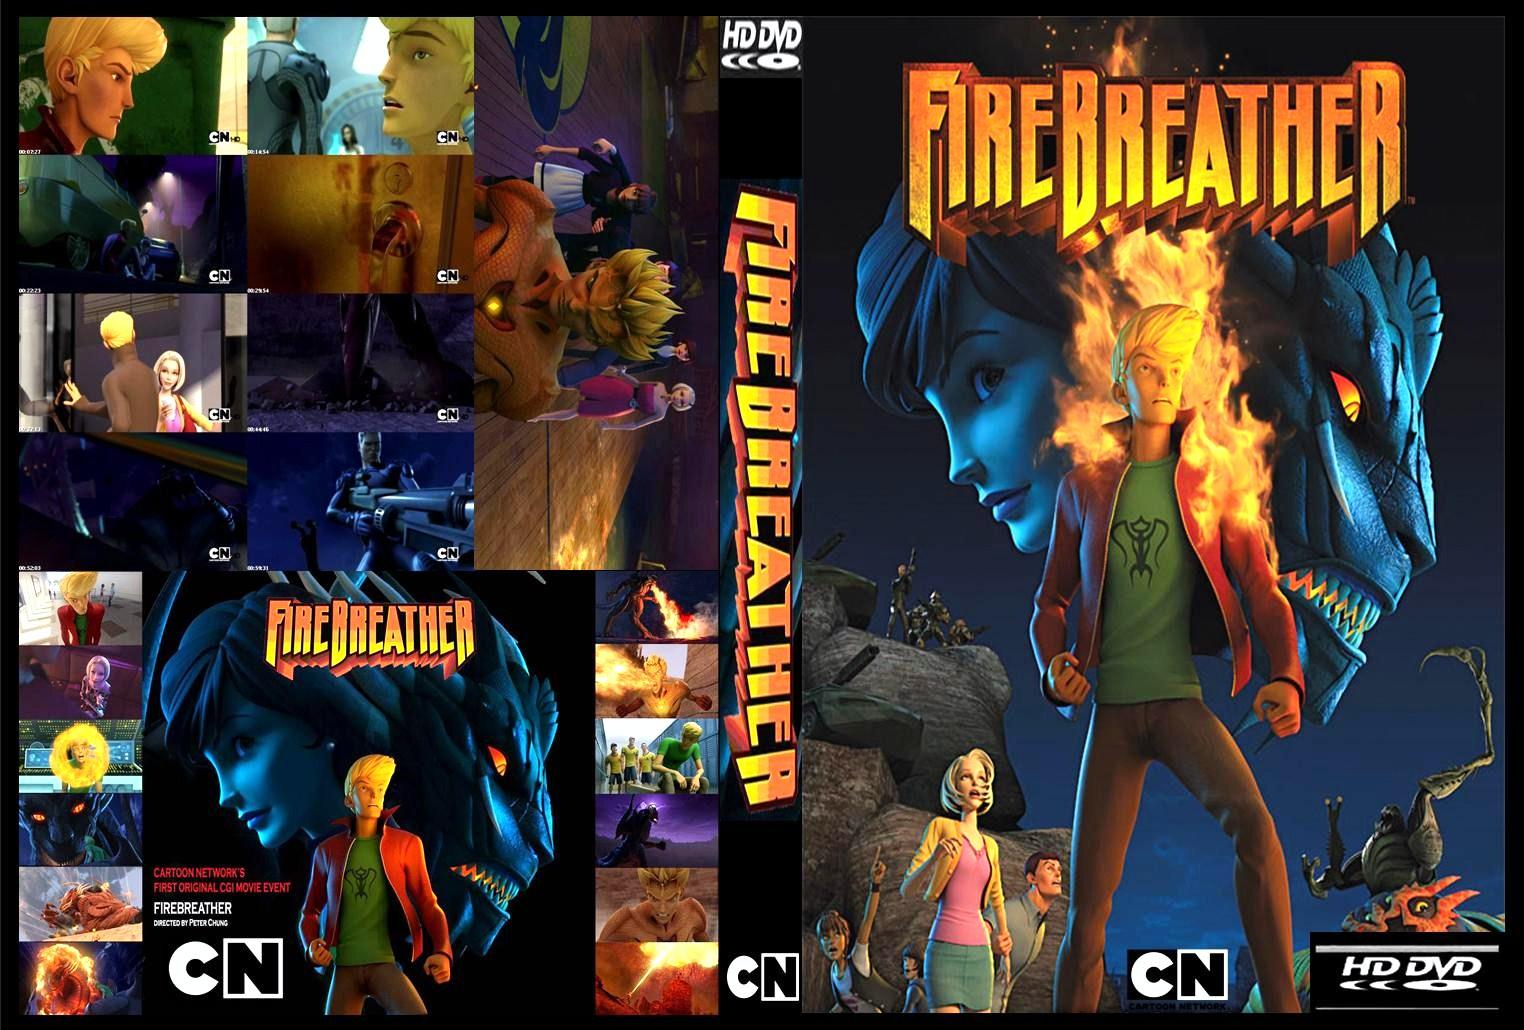 Firebreather (2010) O%2BLan%25C3%25A7a%2BFogo%2B-%2BFirebreather.